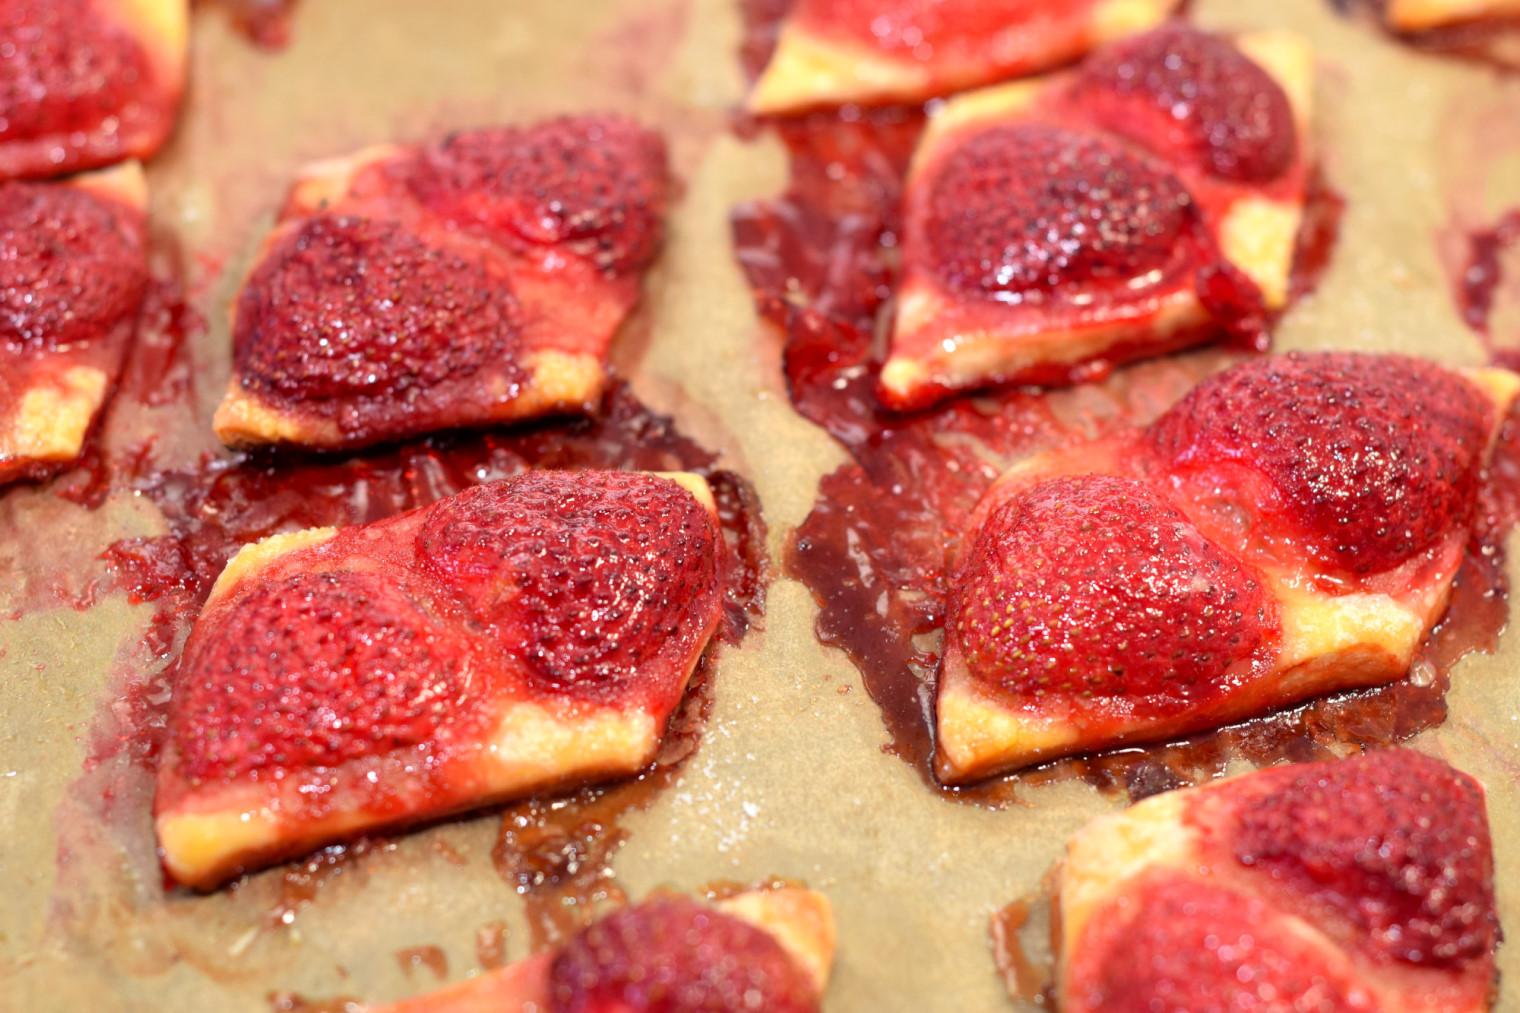 easy bake strawberry squares recipe04